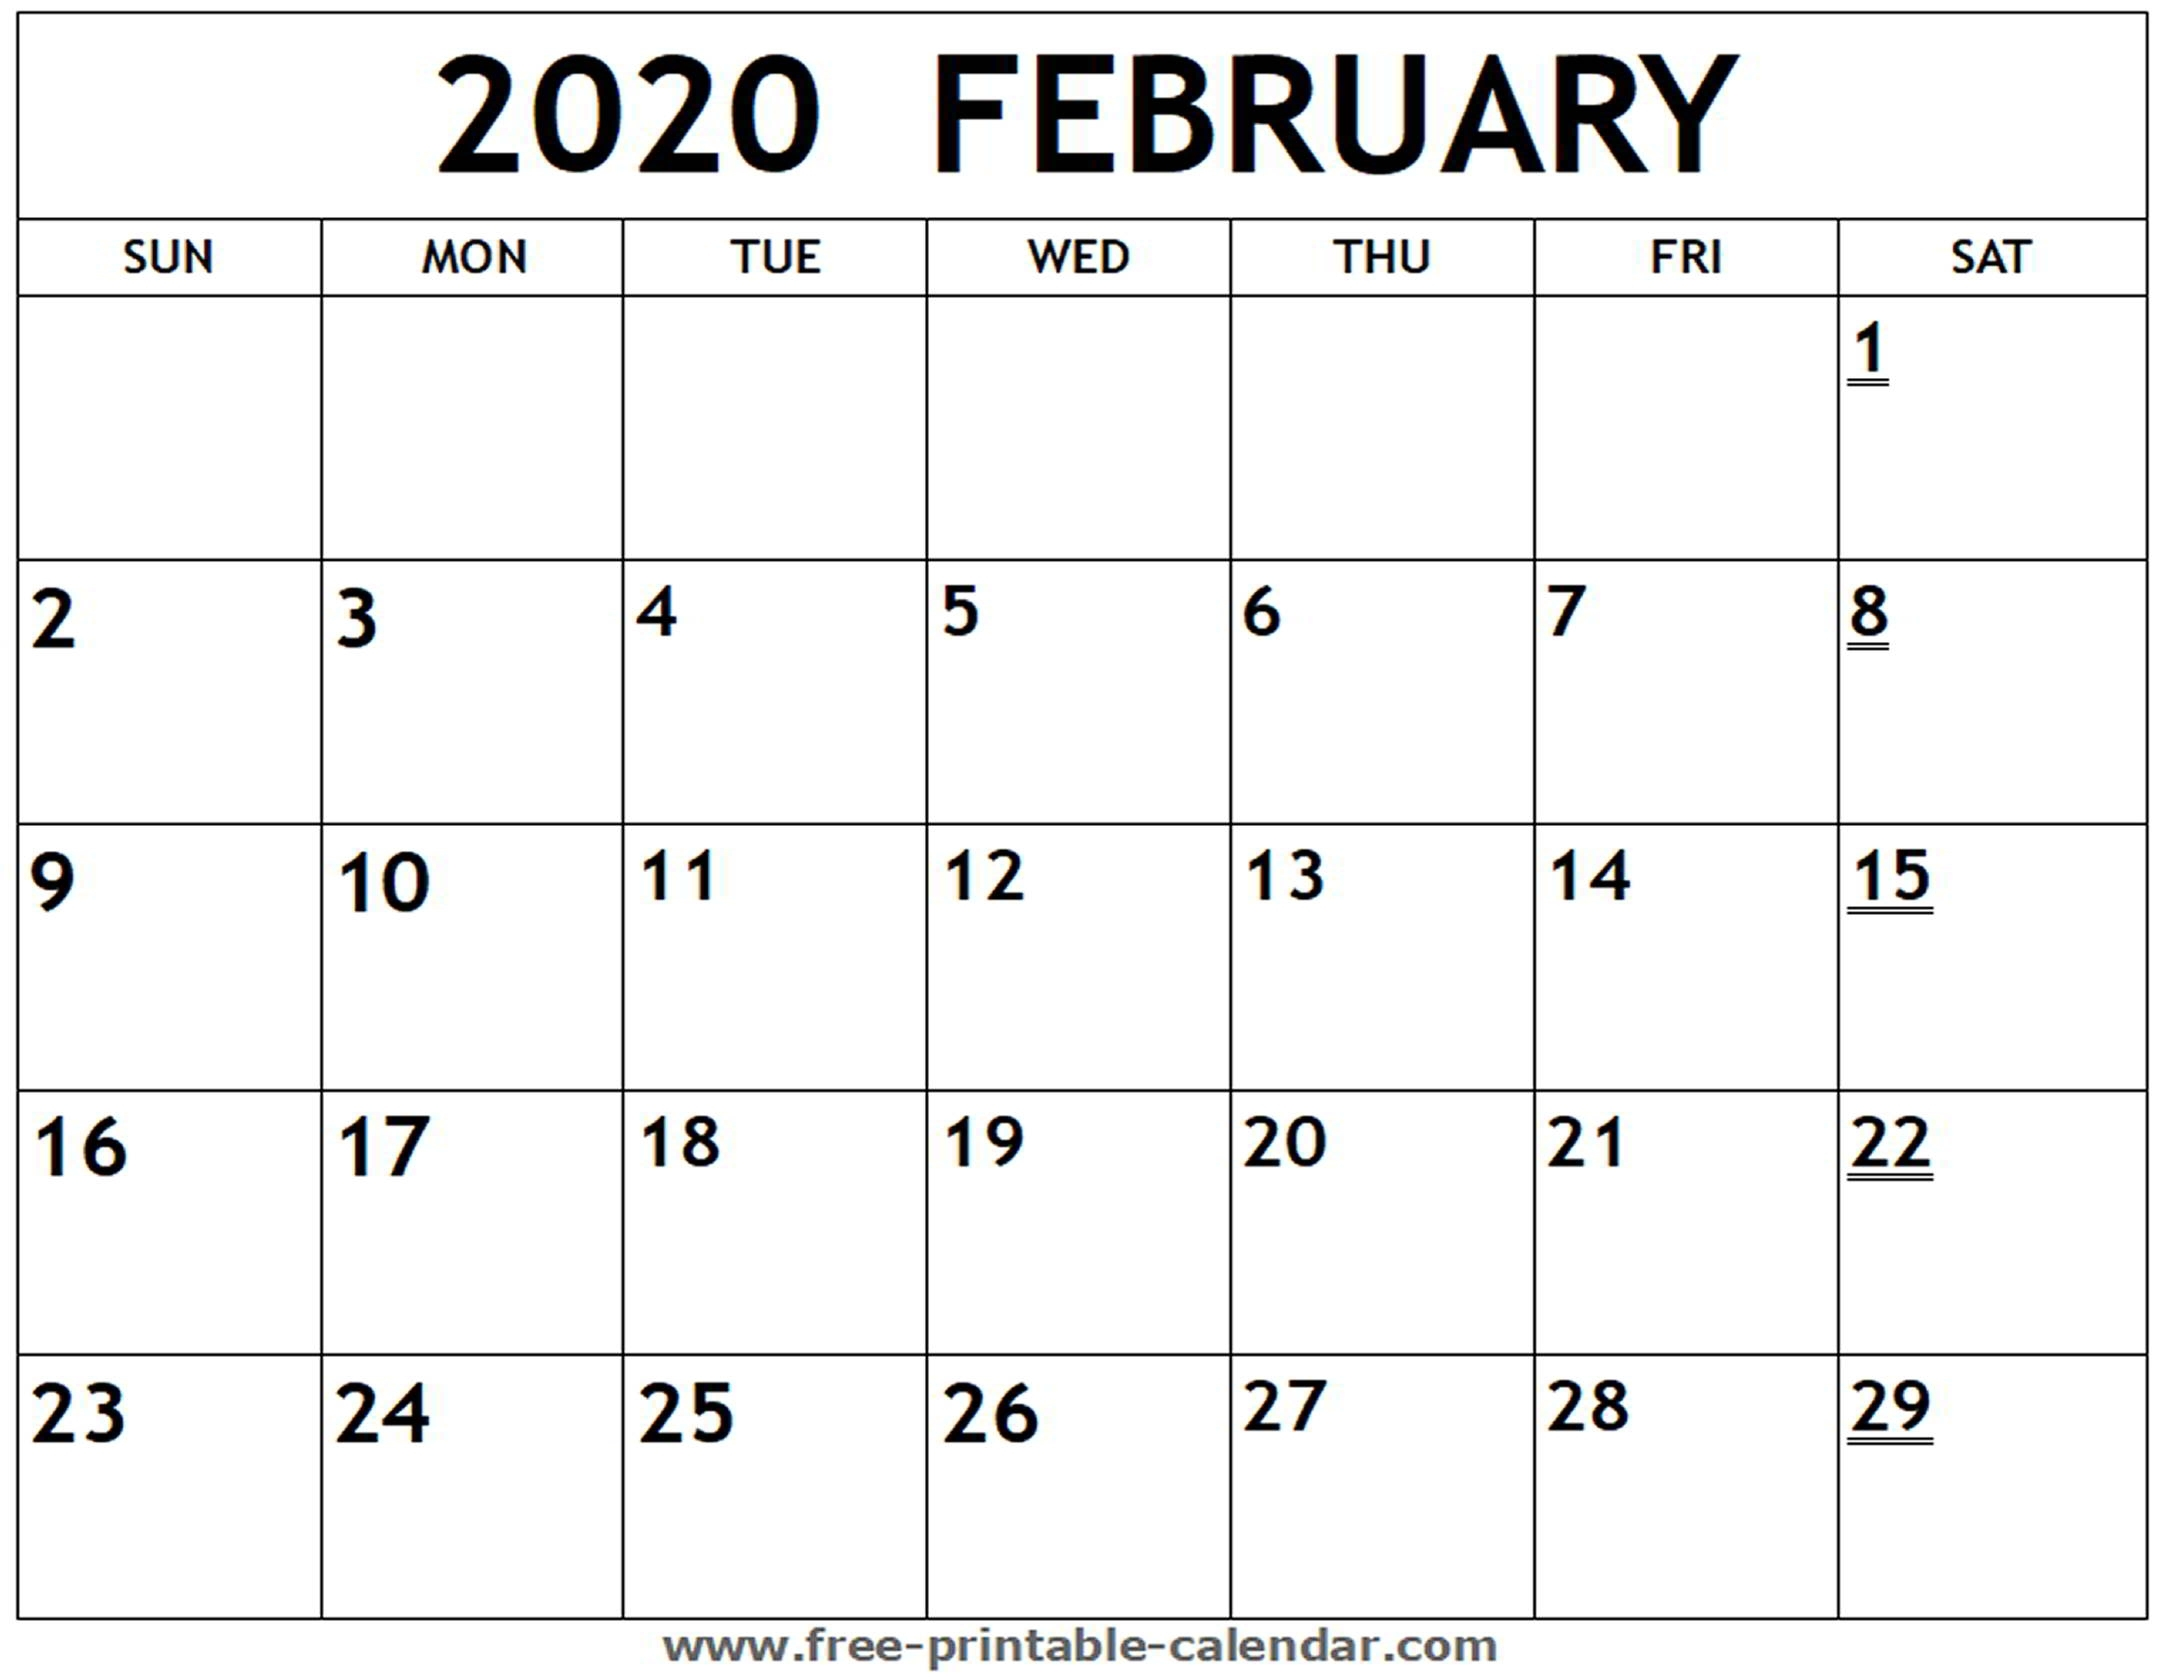 Printable 2020 February Calendar - Free-Printable-Calendar in Printable 2020 Calendar I Can Edit